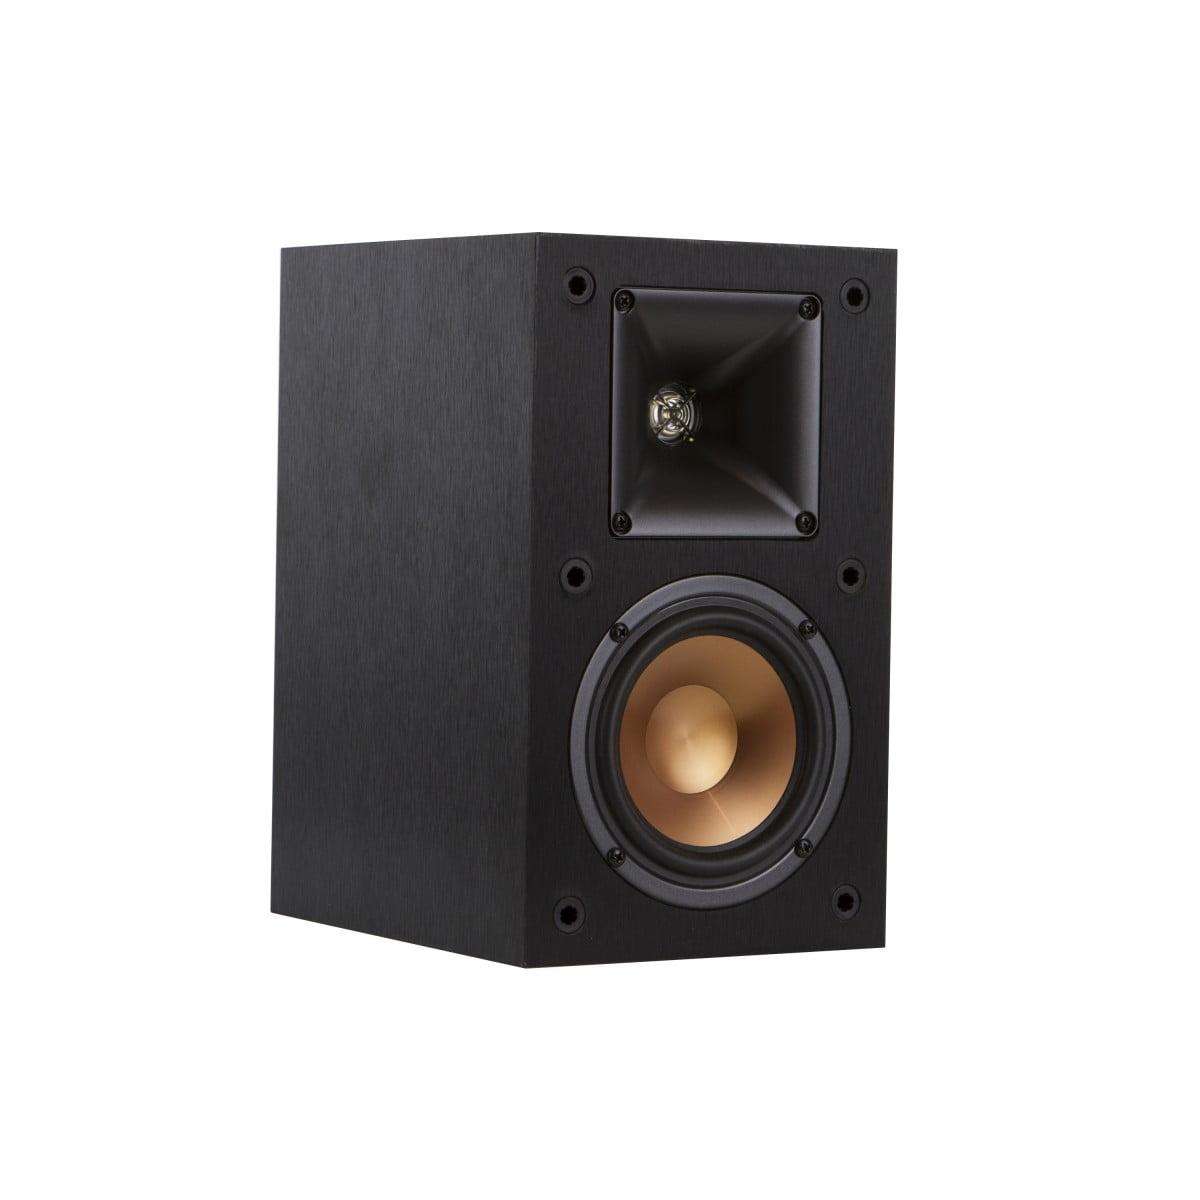 angle efficient bookshelf speaker products rb speakers black most klipsch ii